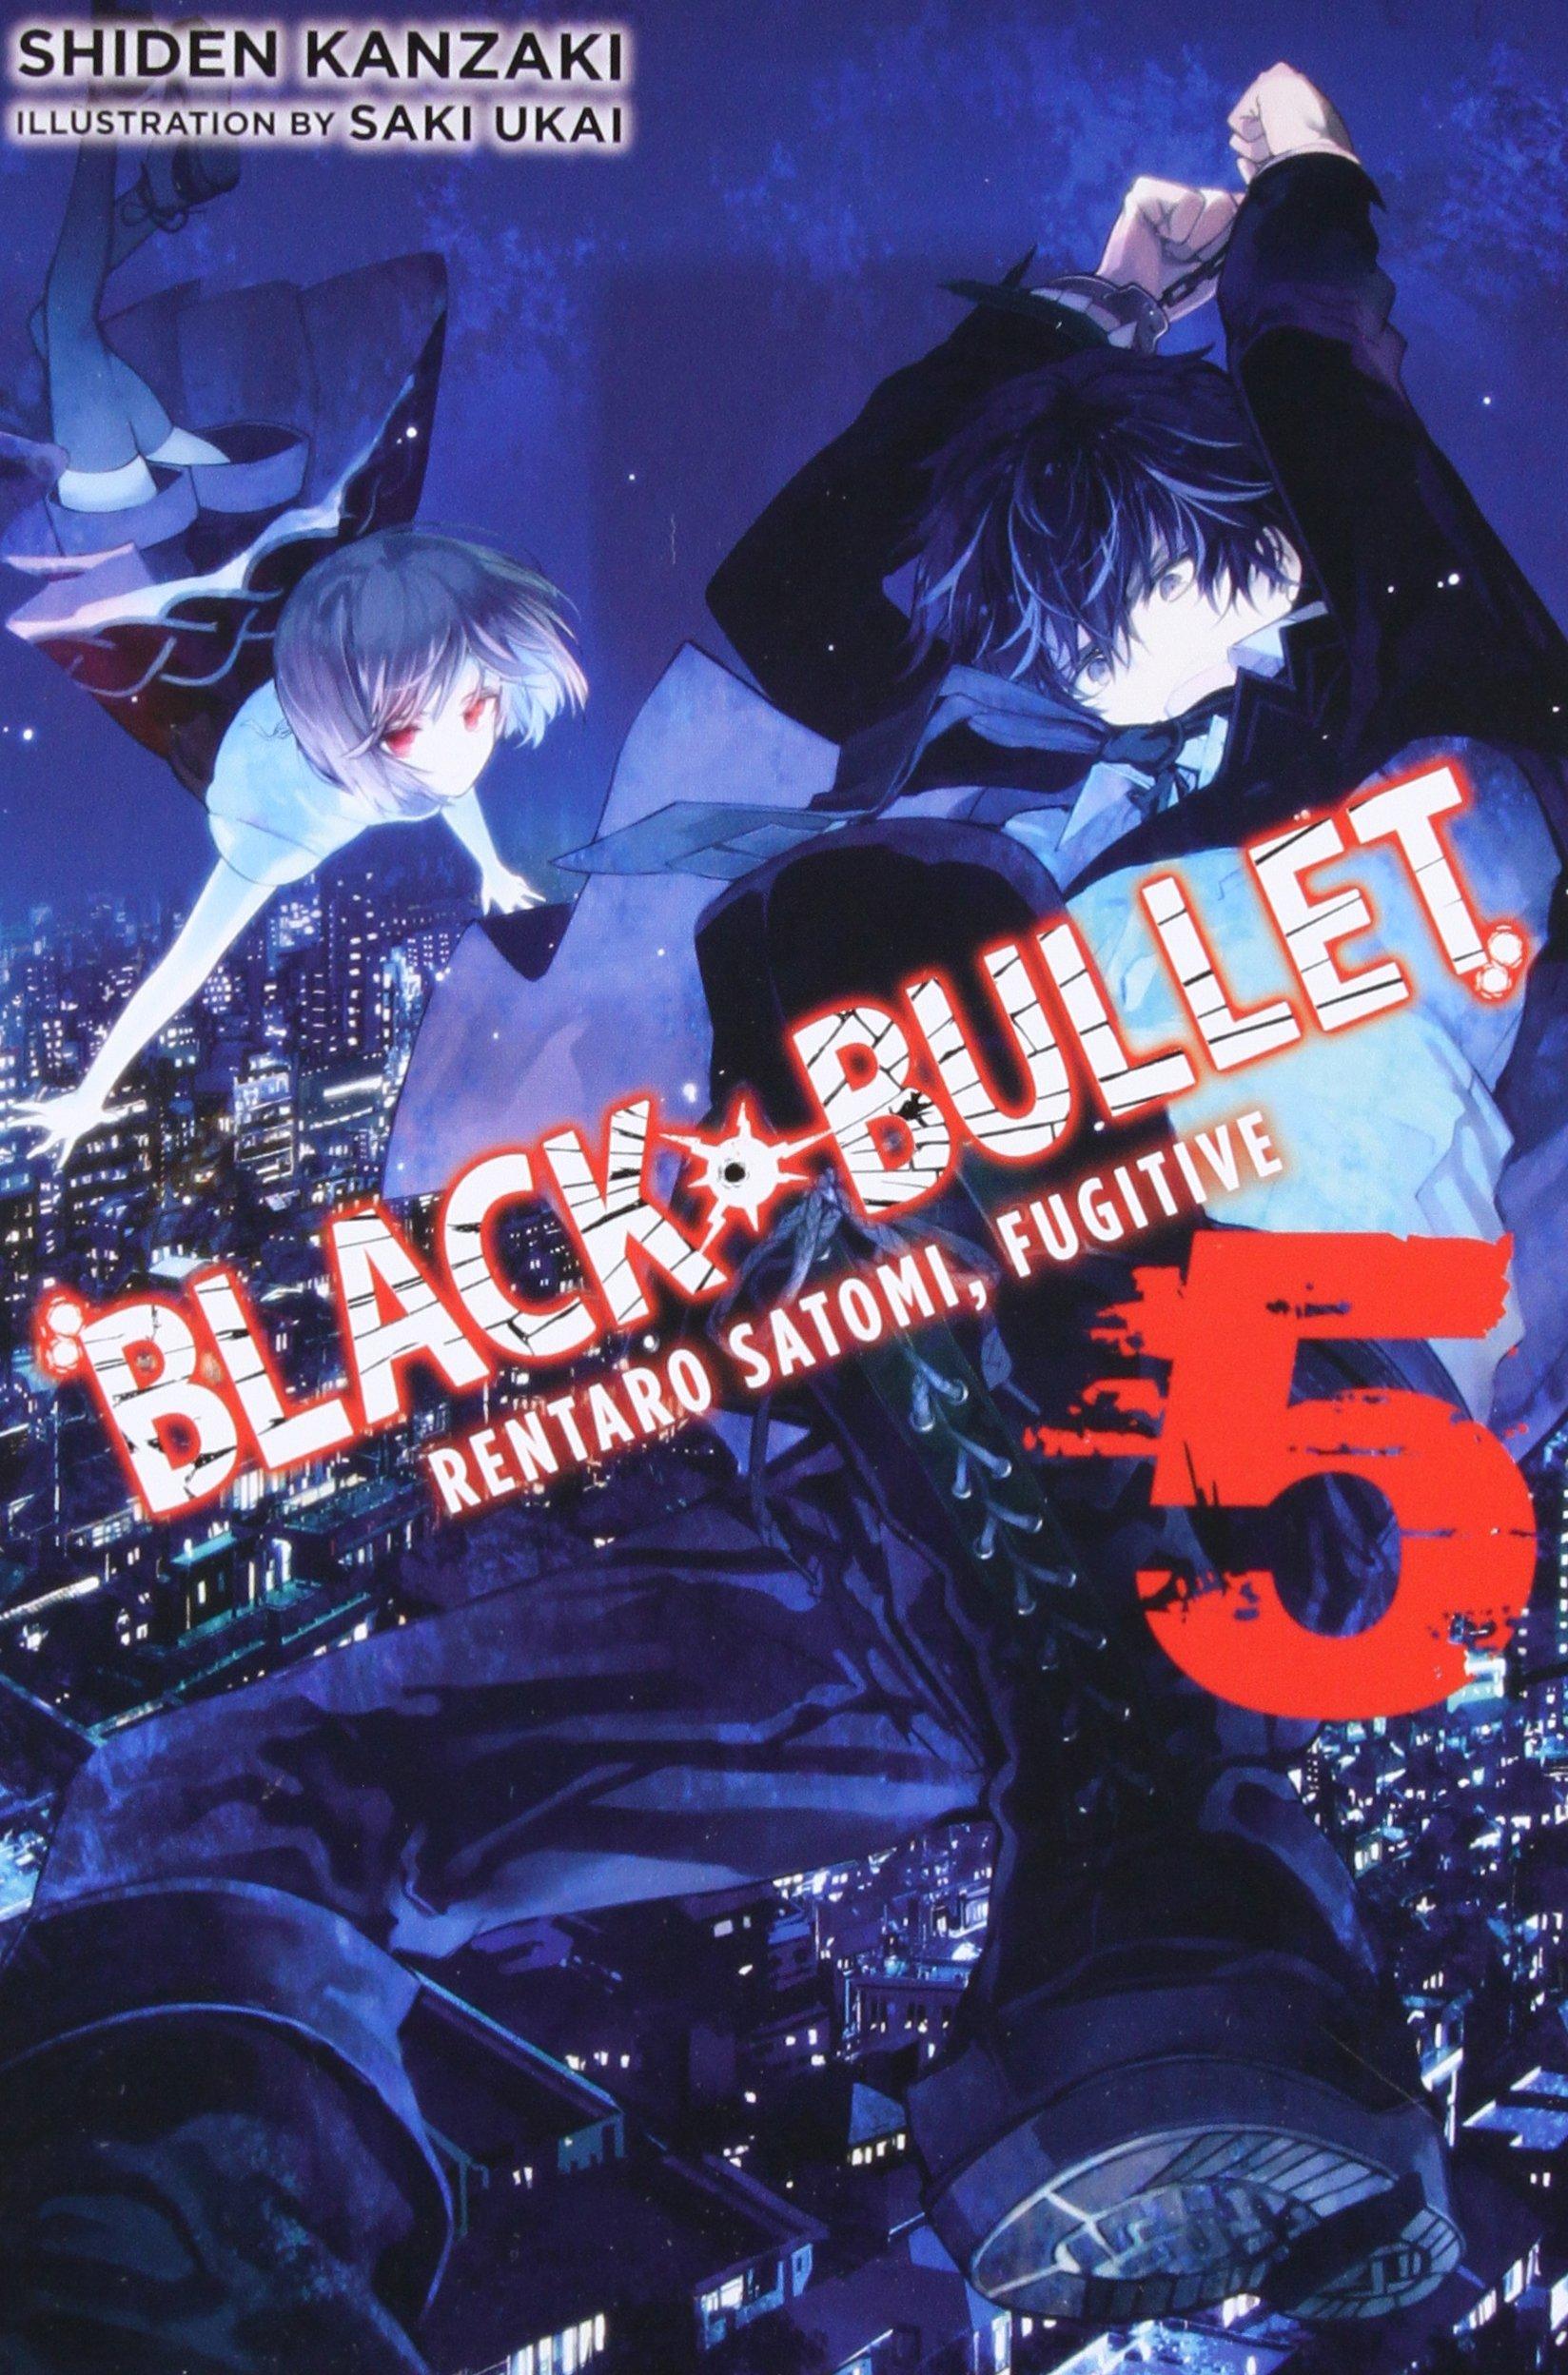 Black Bullet, Vol. 5 (light novel): Rentaro Satomi, Fugitive PDF